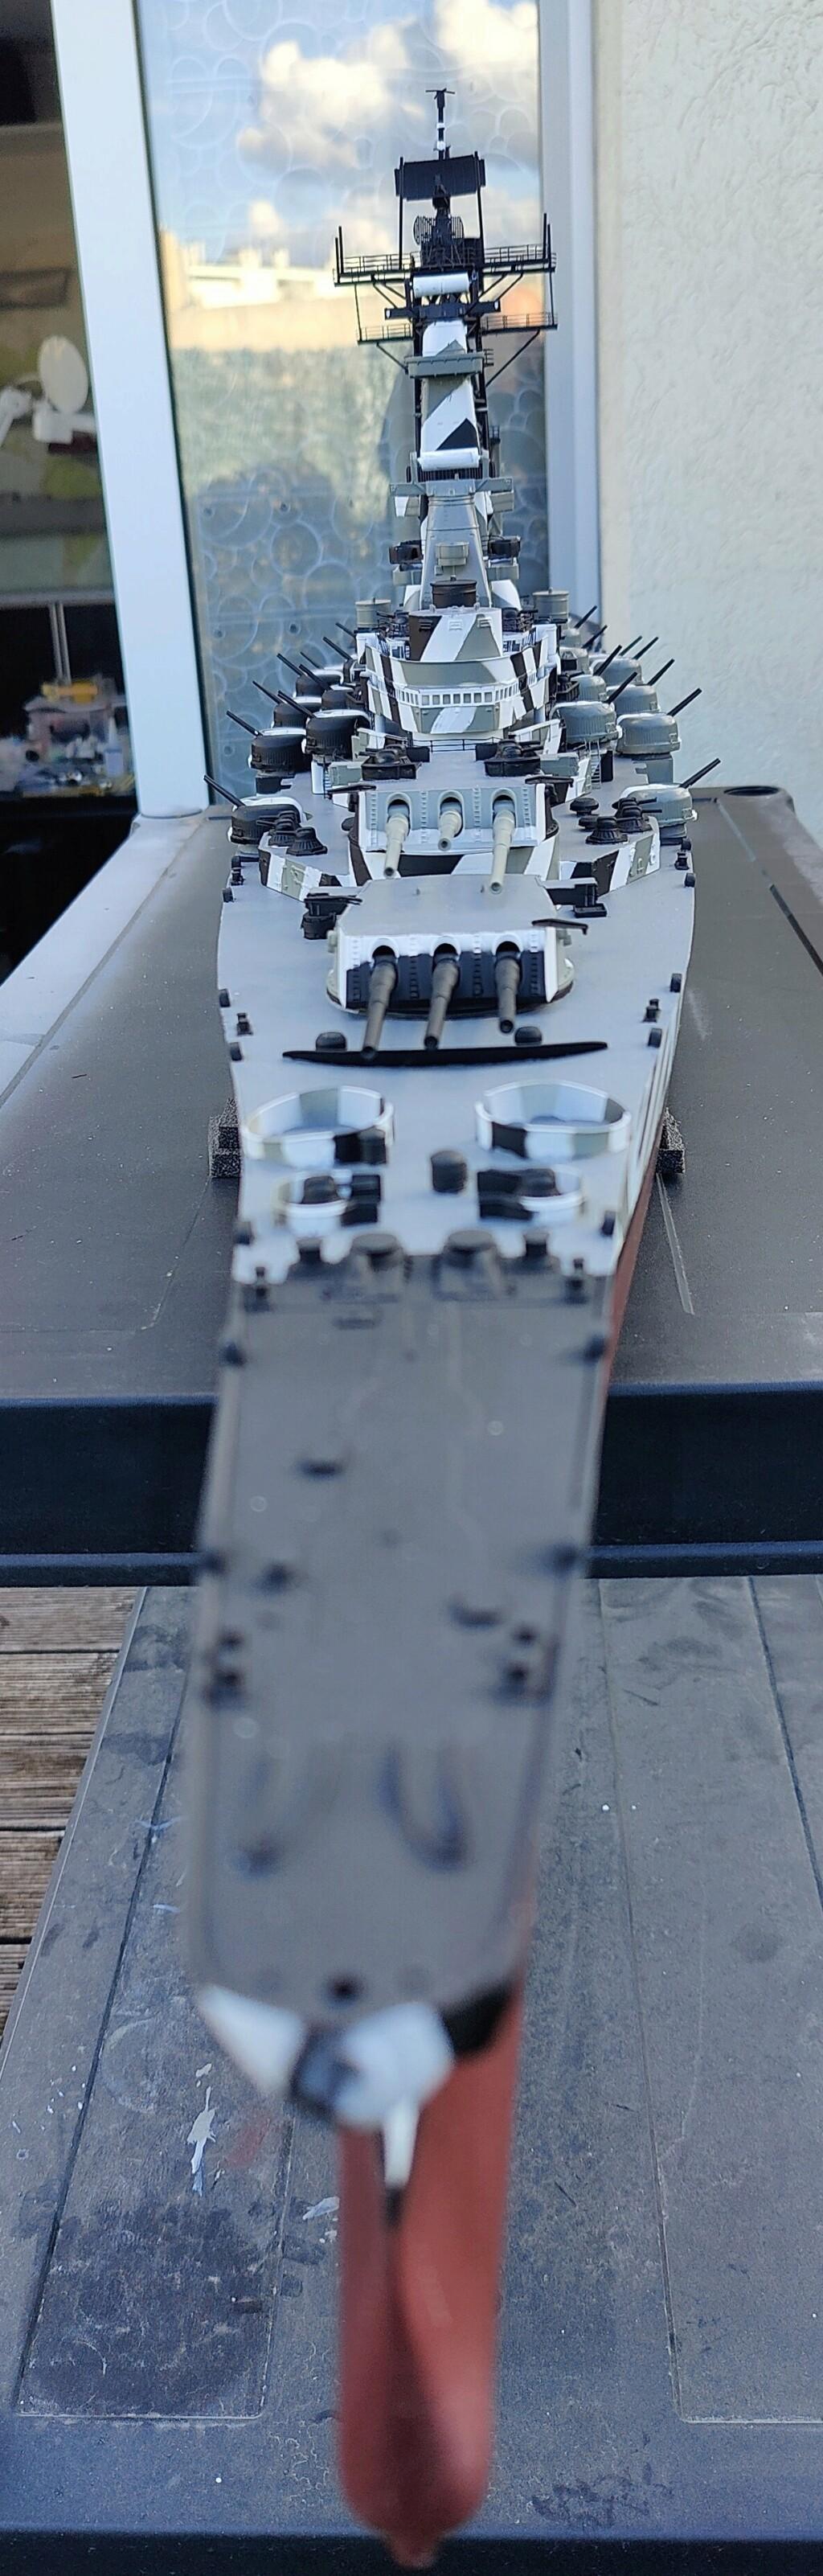 [Uchronie] USS Lake Michigan (base Iowa Trumpeter 1/200°) par hibikitokay - Page 7 Img_2120